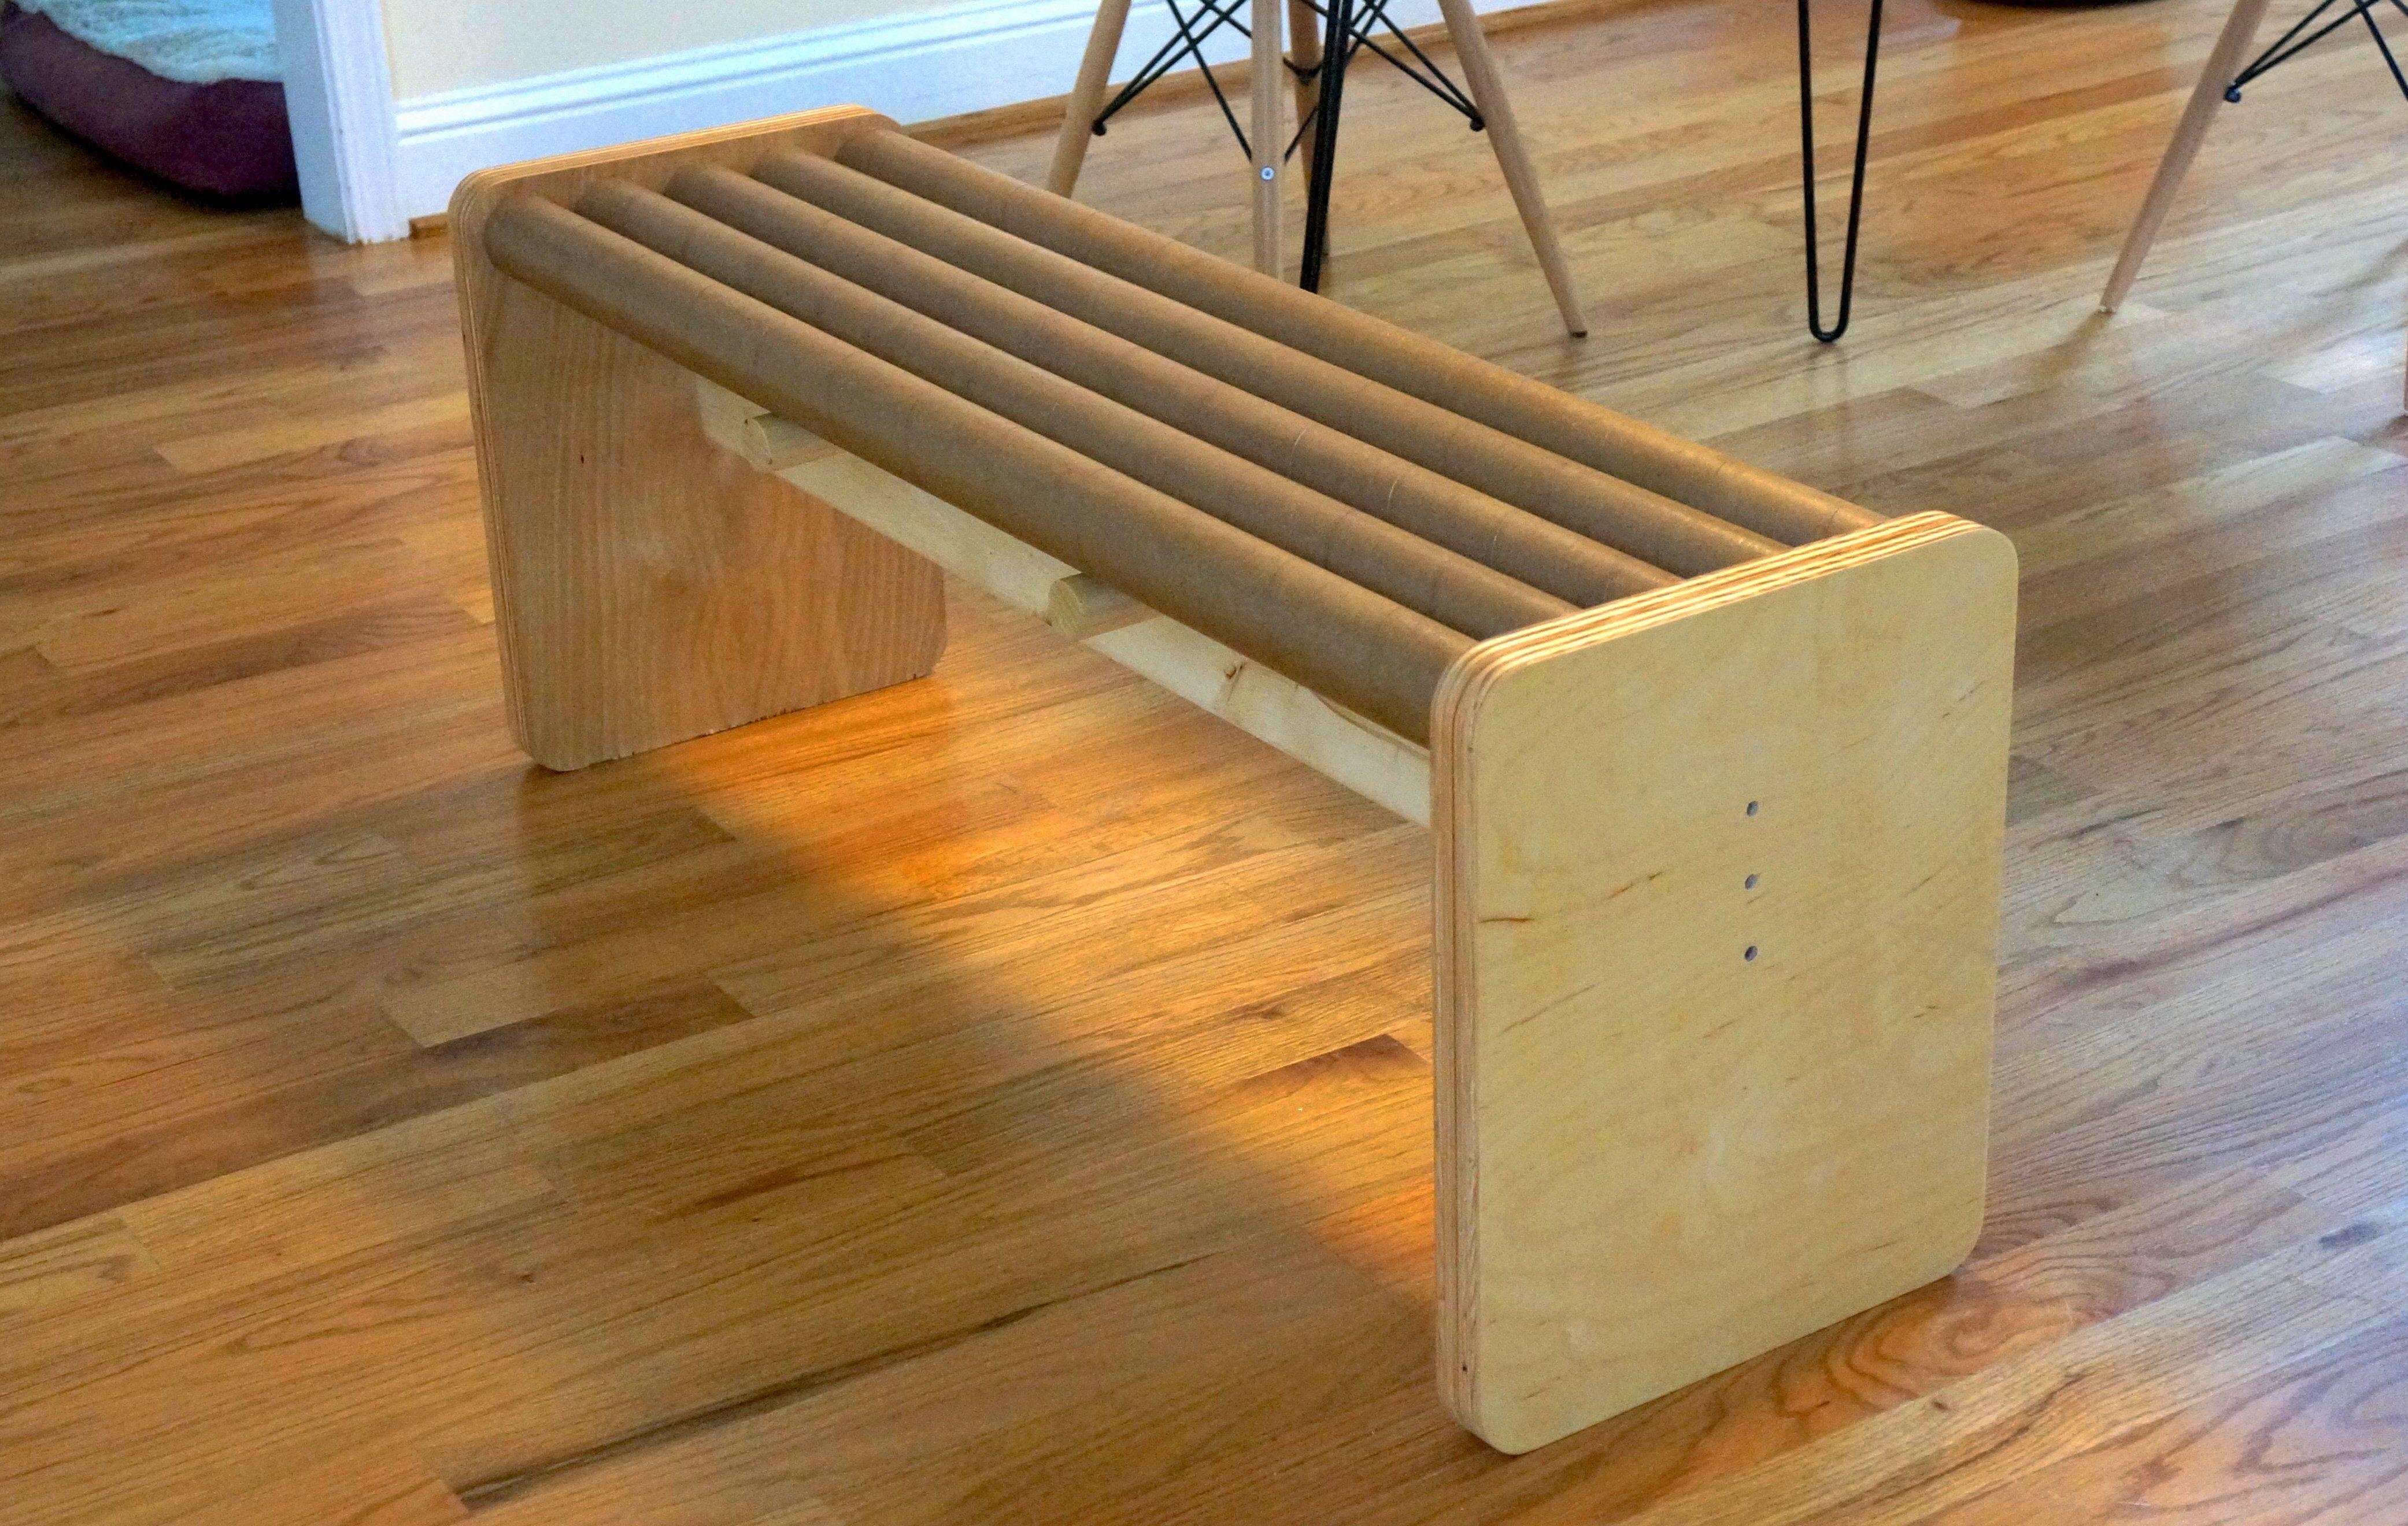 make cardboard furniture. Build A Modern Bench With Cardboard Tubes Make Furniture